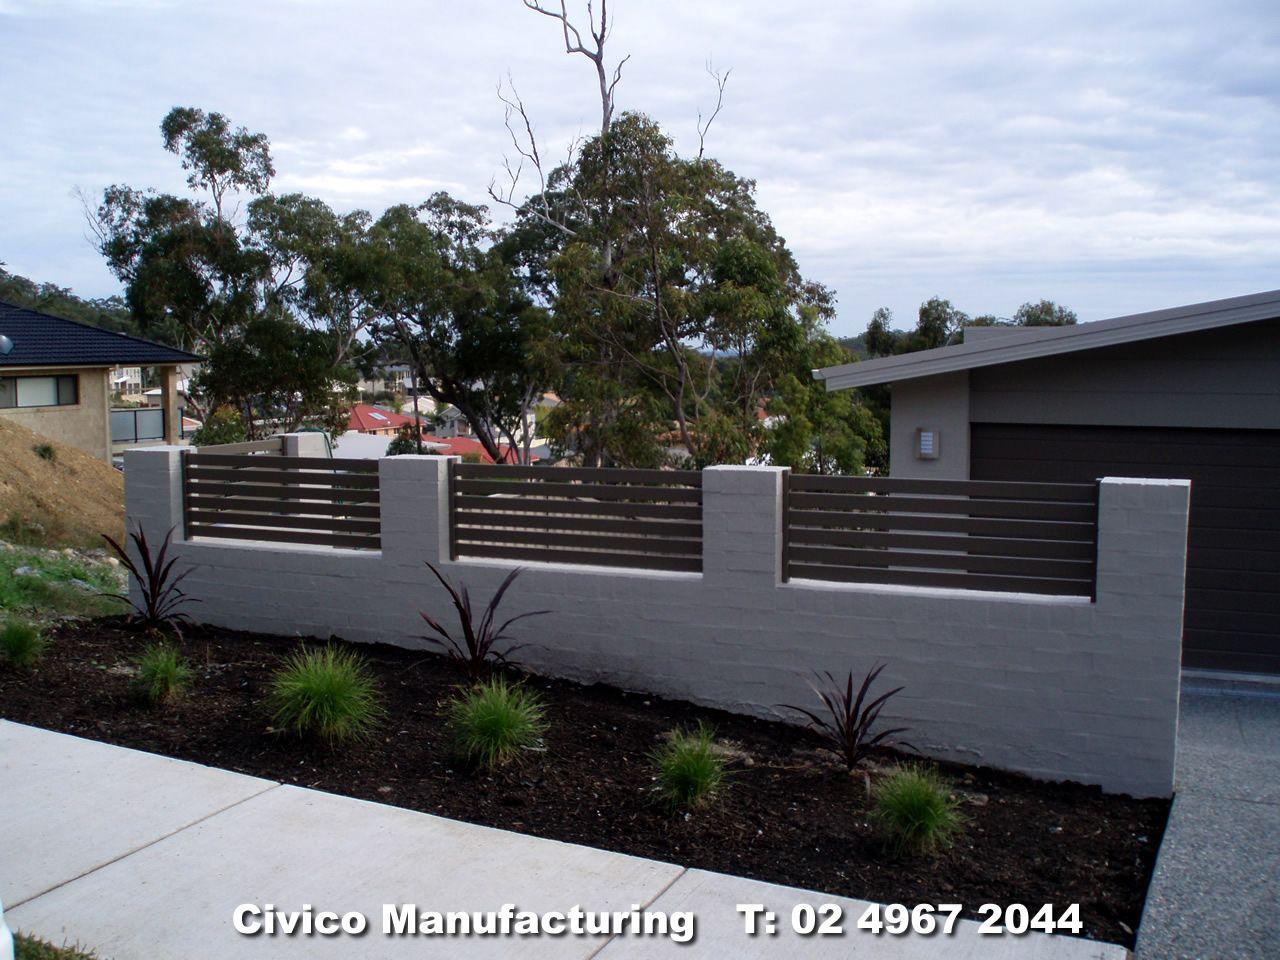 Aluminium horizontal slat fencing our house vorgarten zaun zaun garten - Zaun vorgarten ...